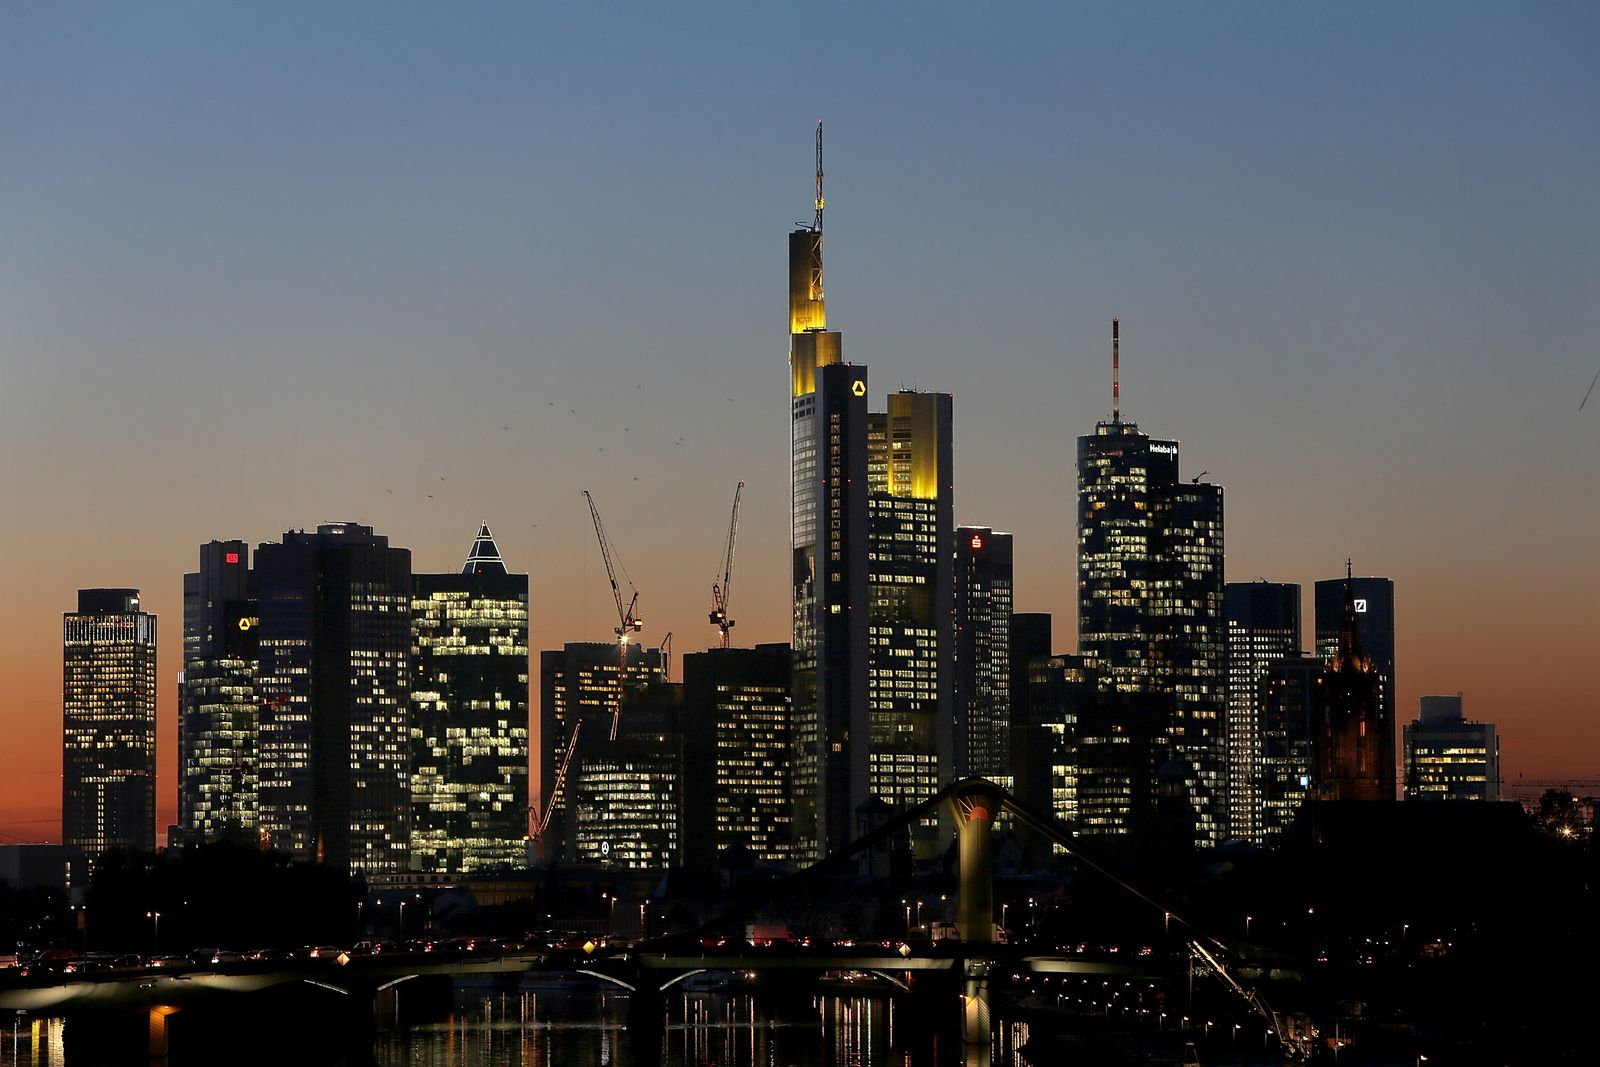 Banken / Skyline Frankfurt